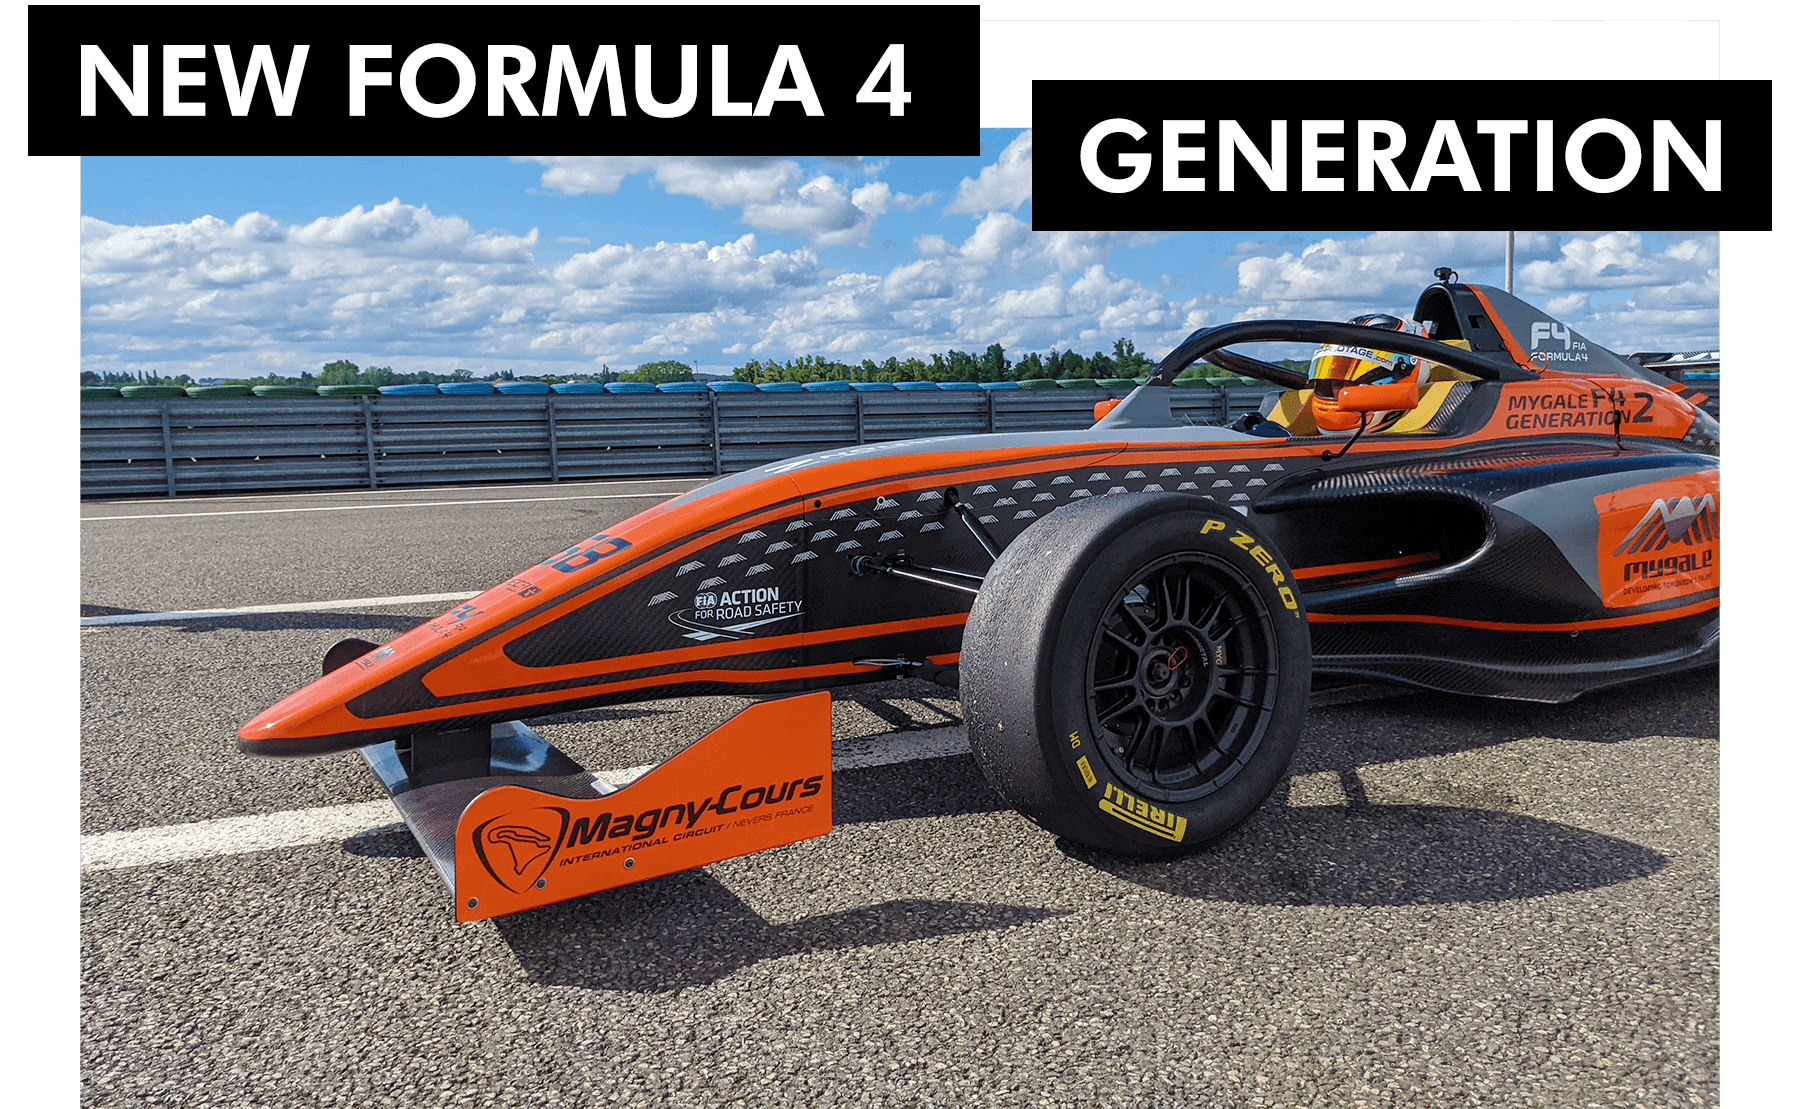 New Formula 4 Generation